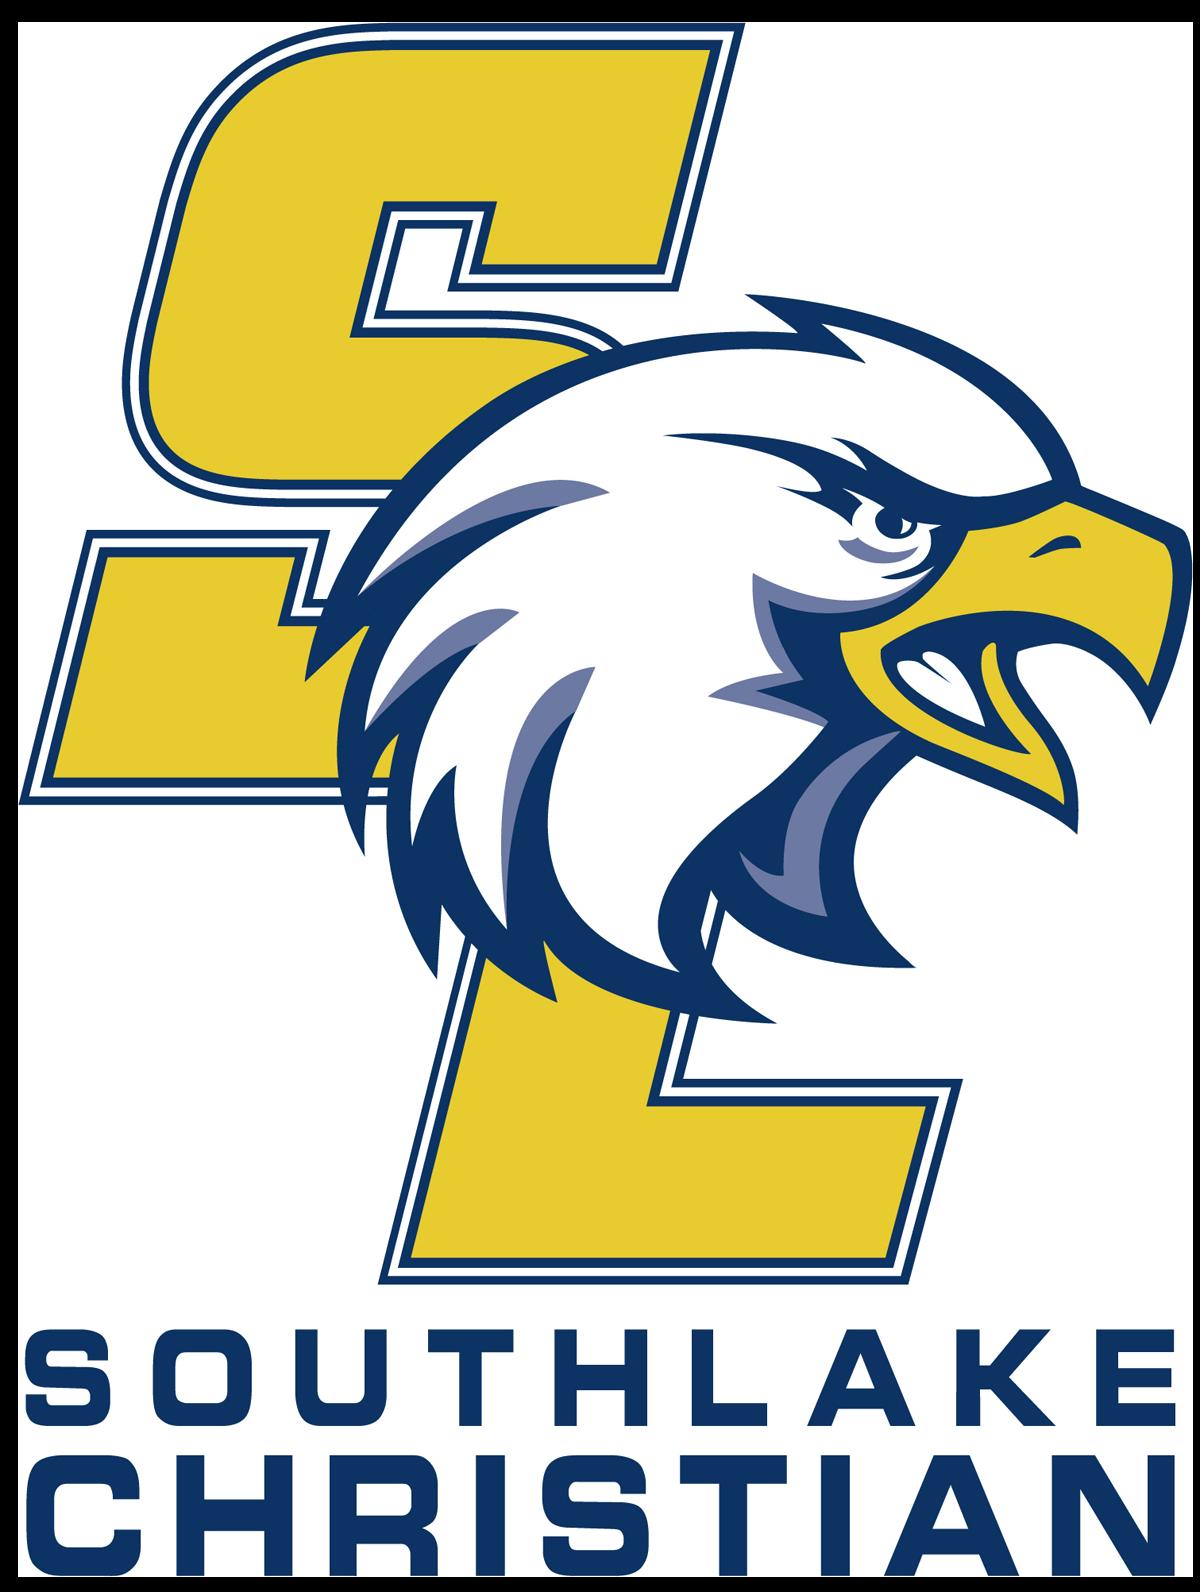 Handbook southlake christian academy. Yelling clipart infraction